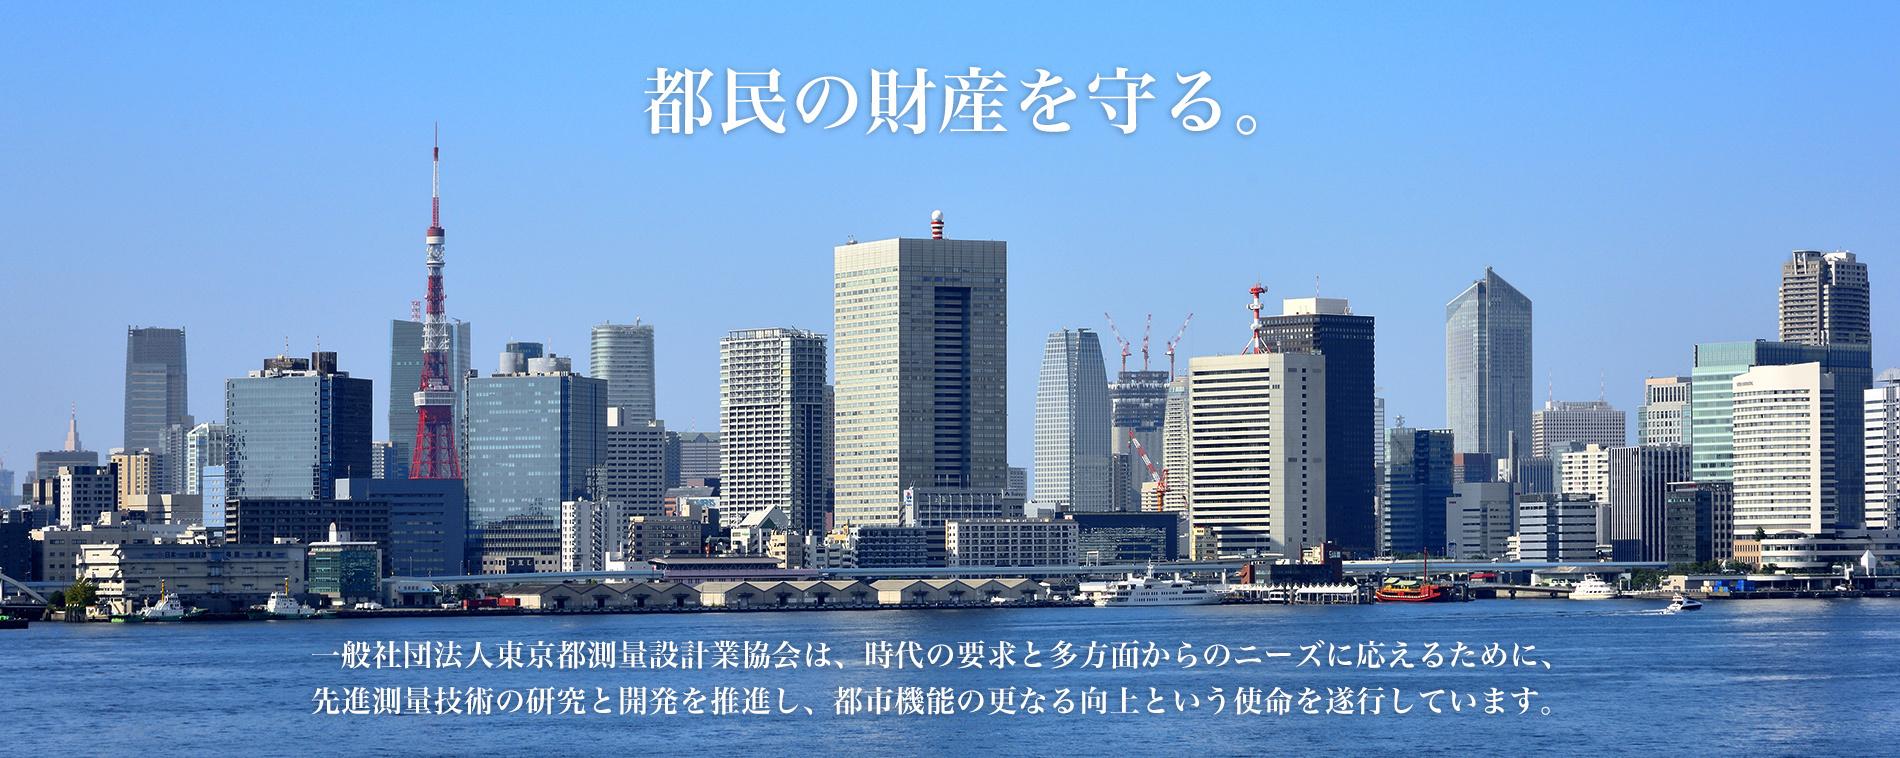 都民の財産を守る。一般社団法人東京都測量設計業協会